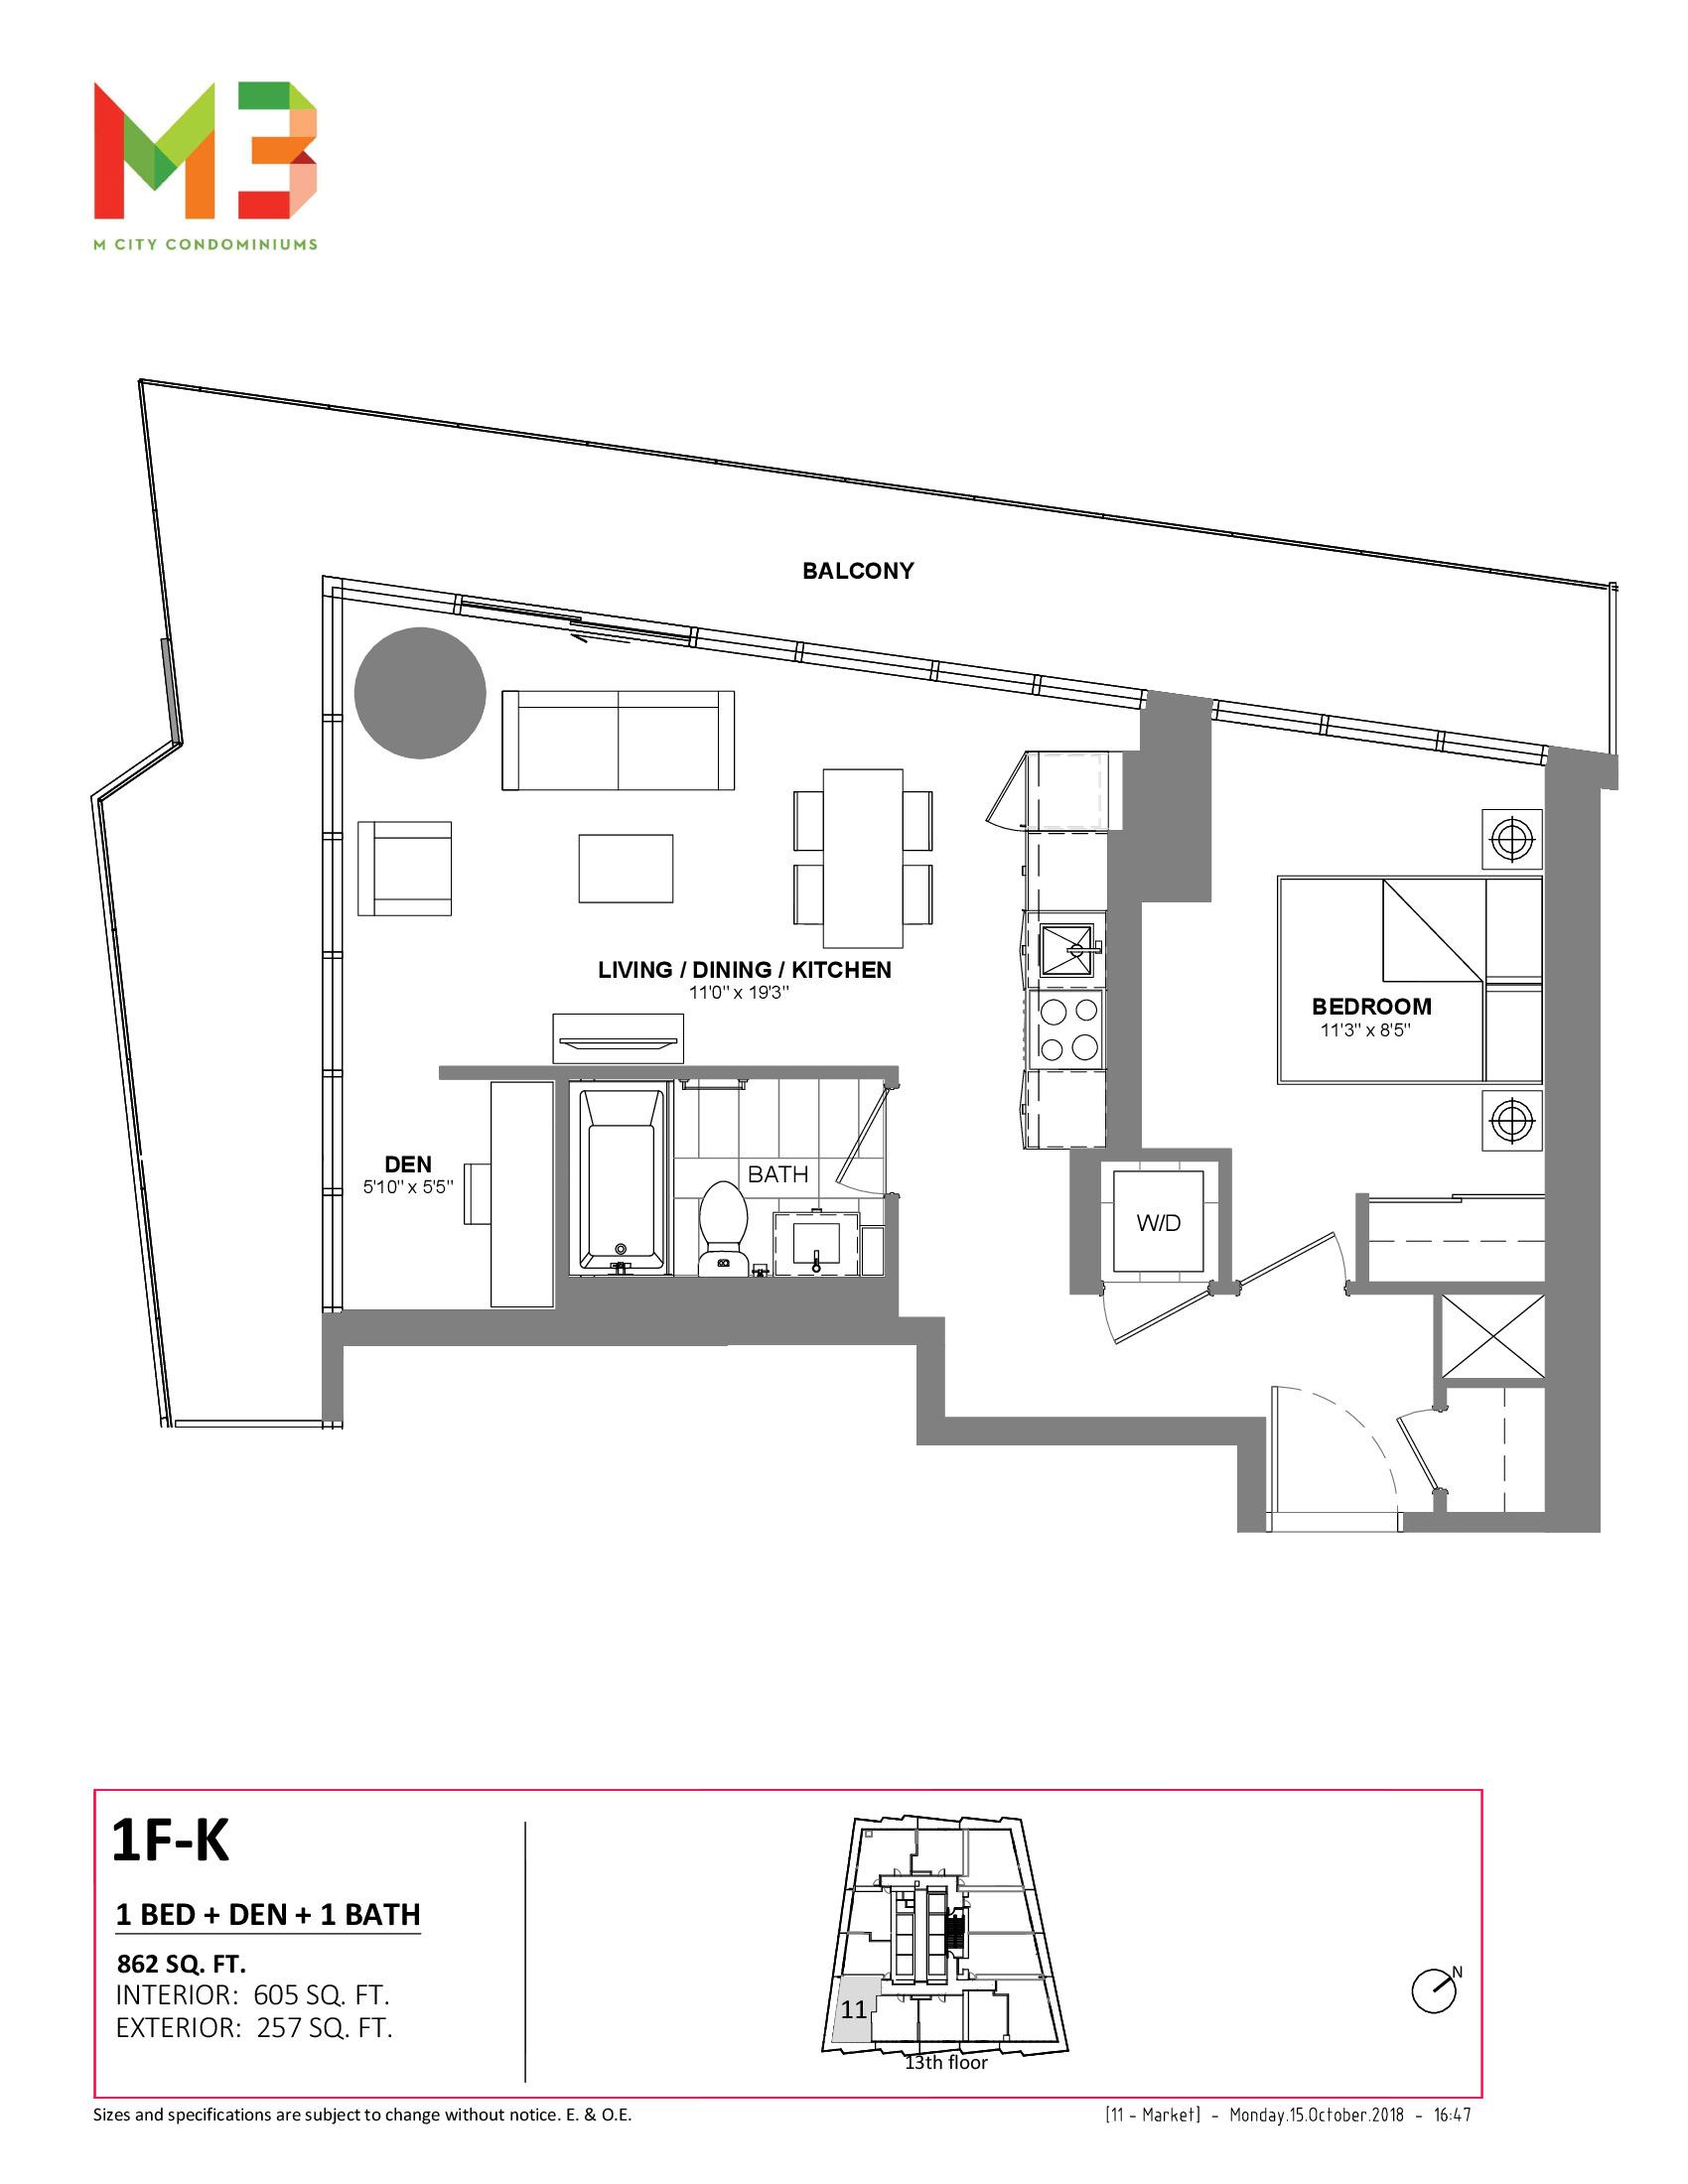 1F-K Floor Plan at M3 Condos - 605 sq.ft